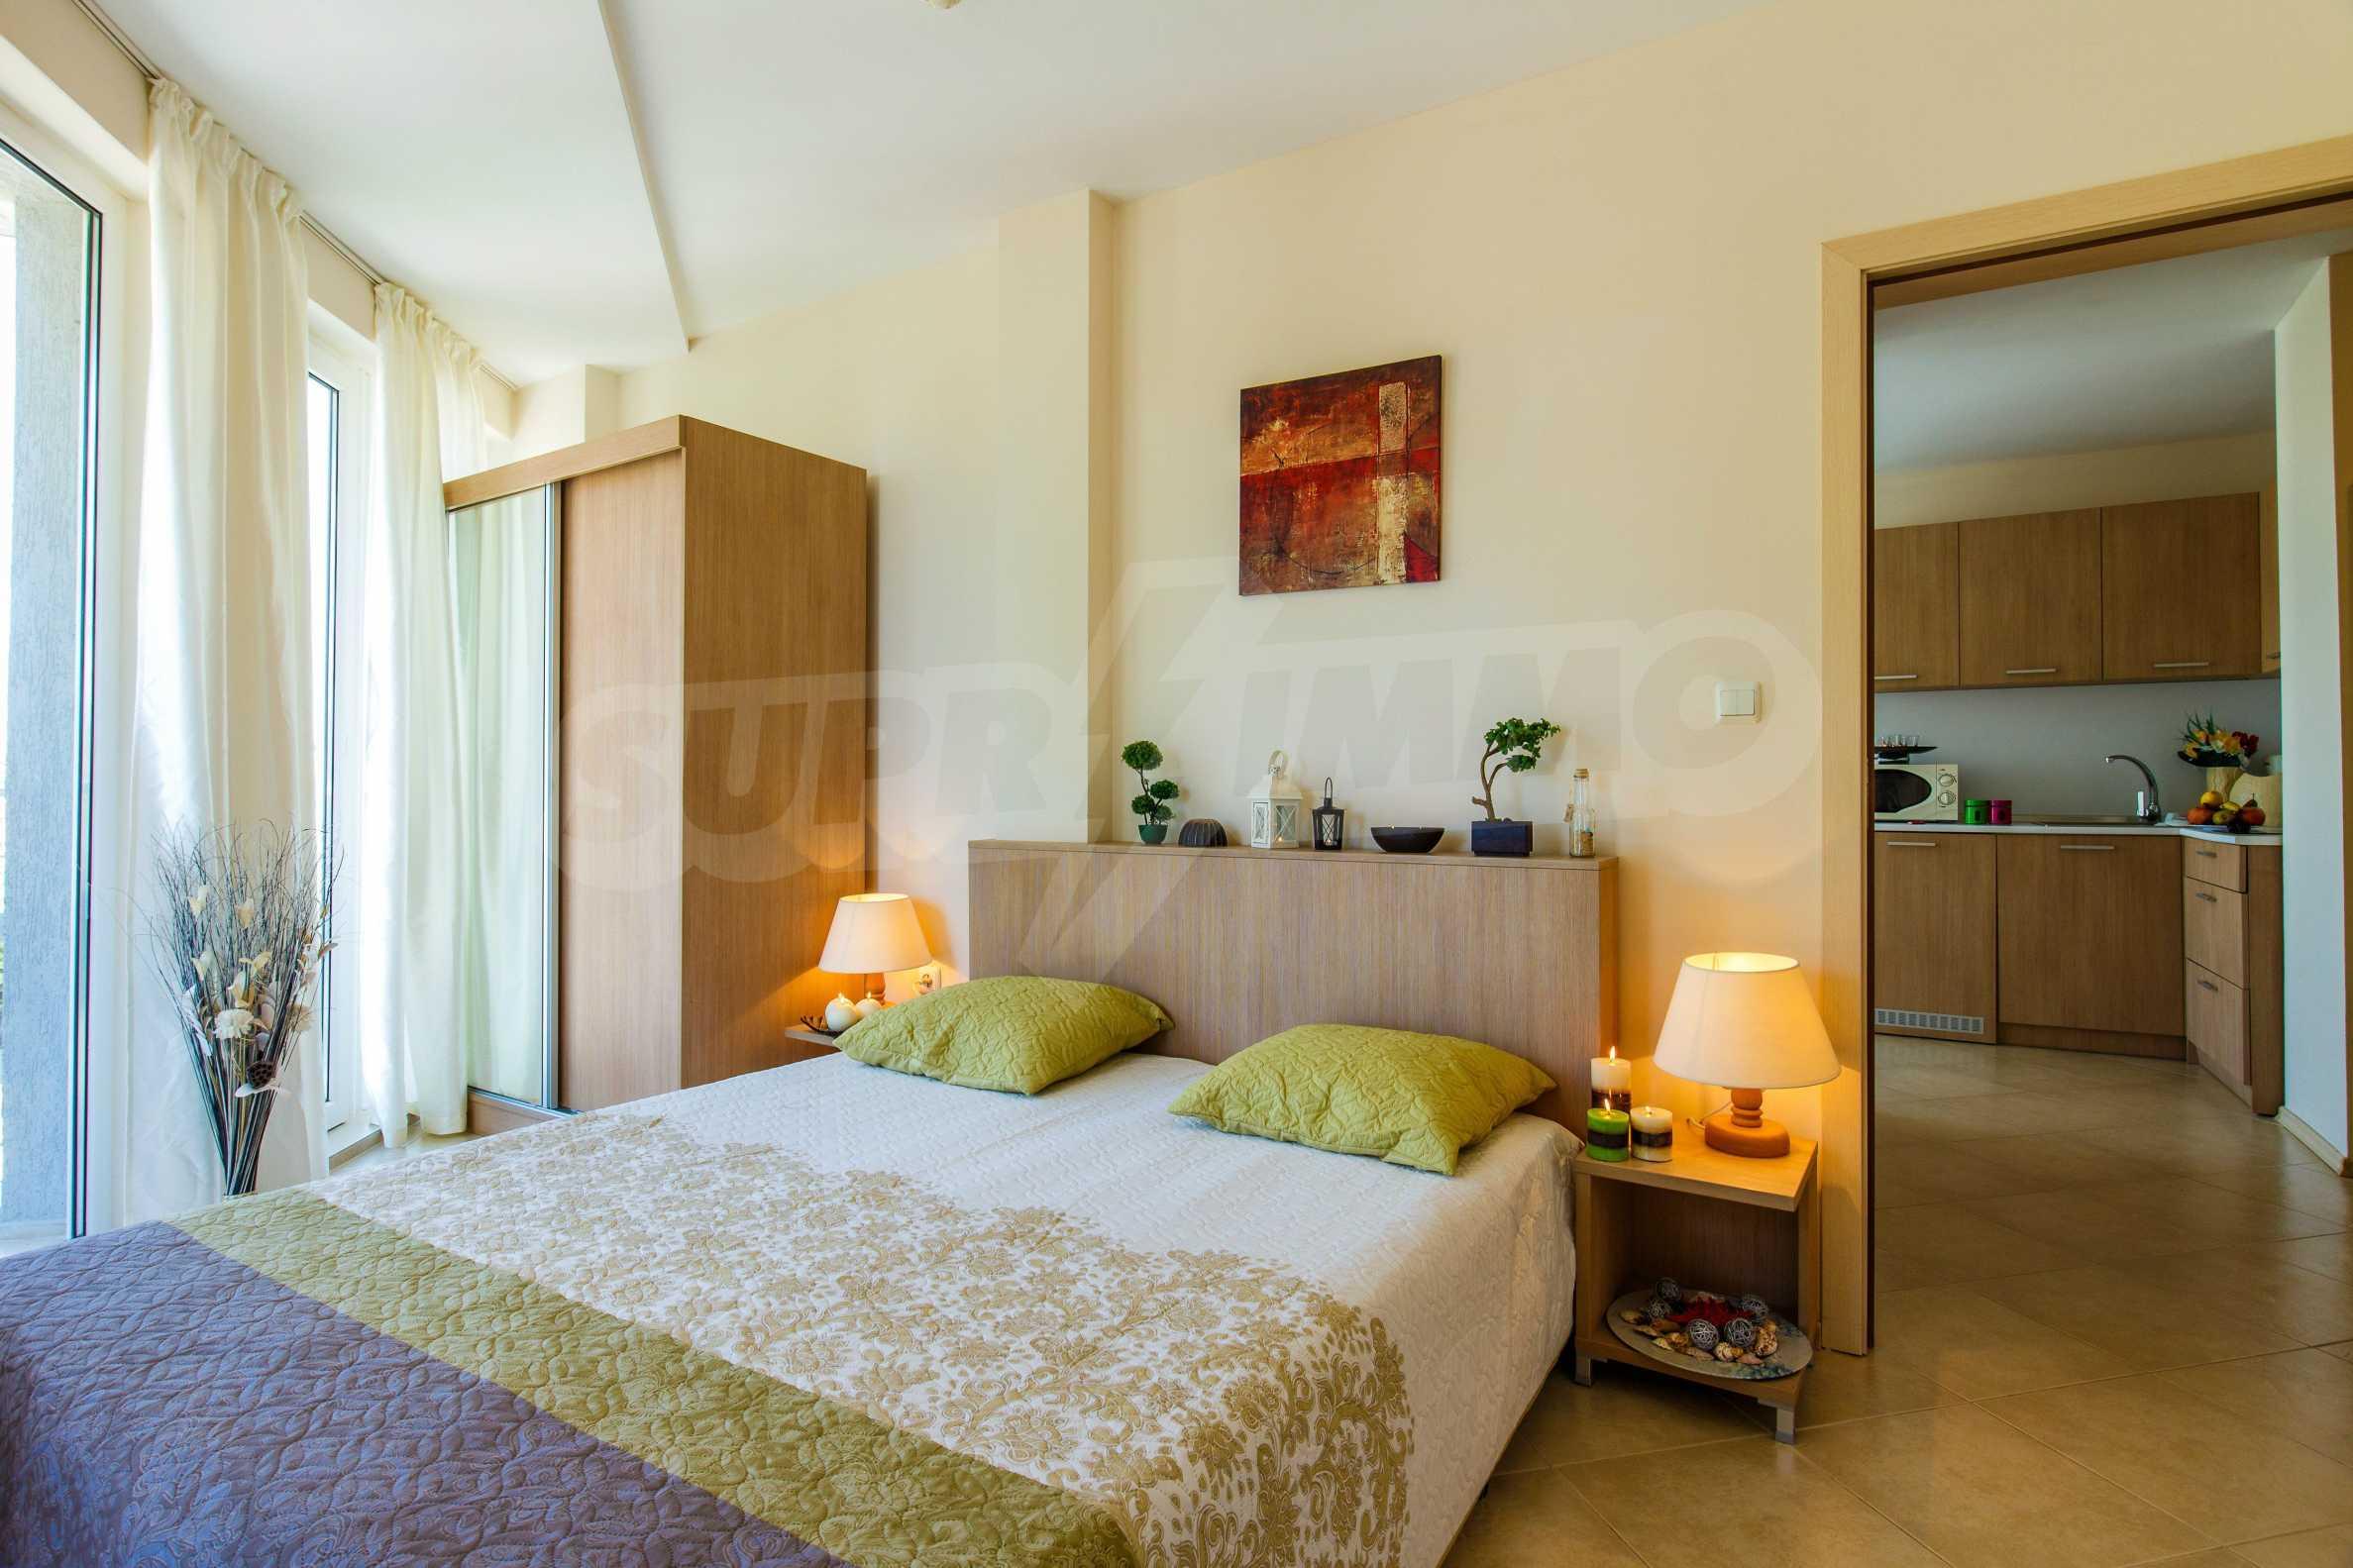 Тристаен апартамент в комплекс Емберли близо до плажа в Лозенец (ап. №423) 17